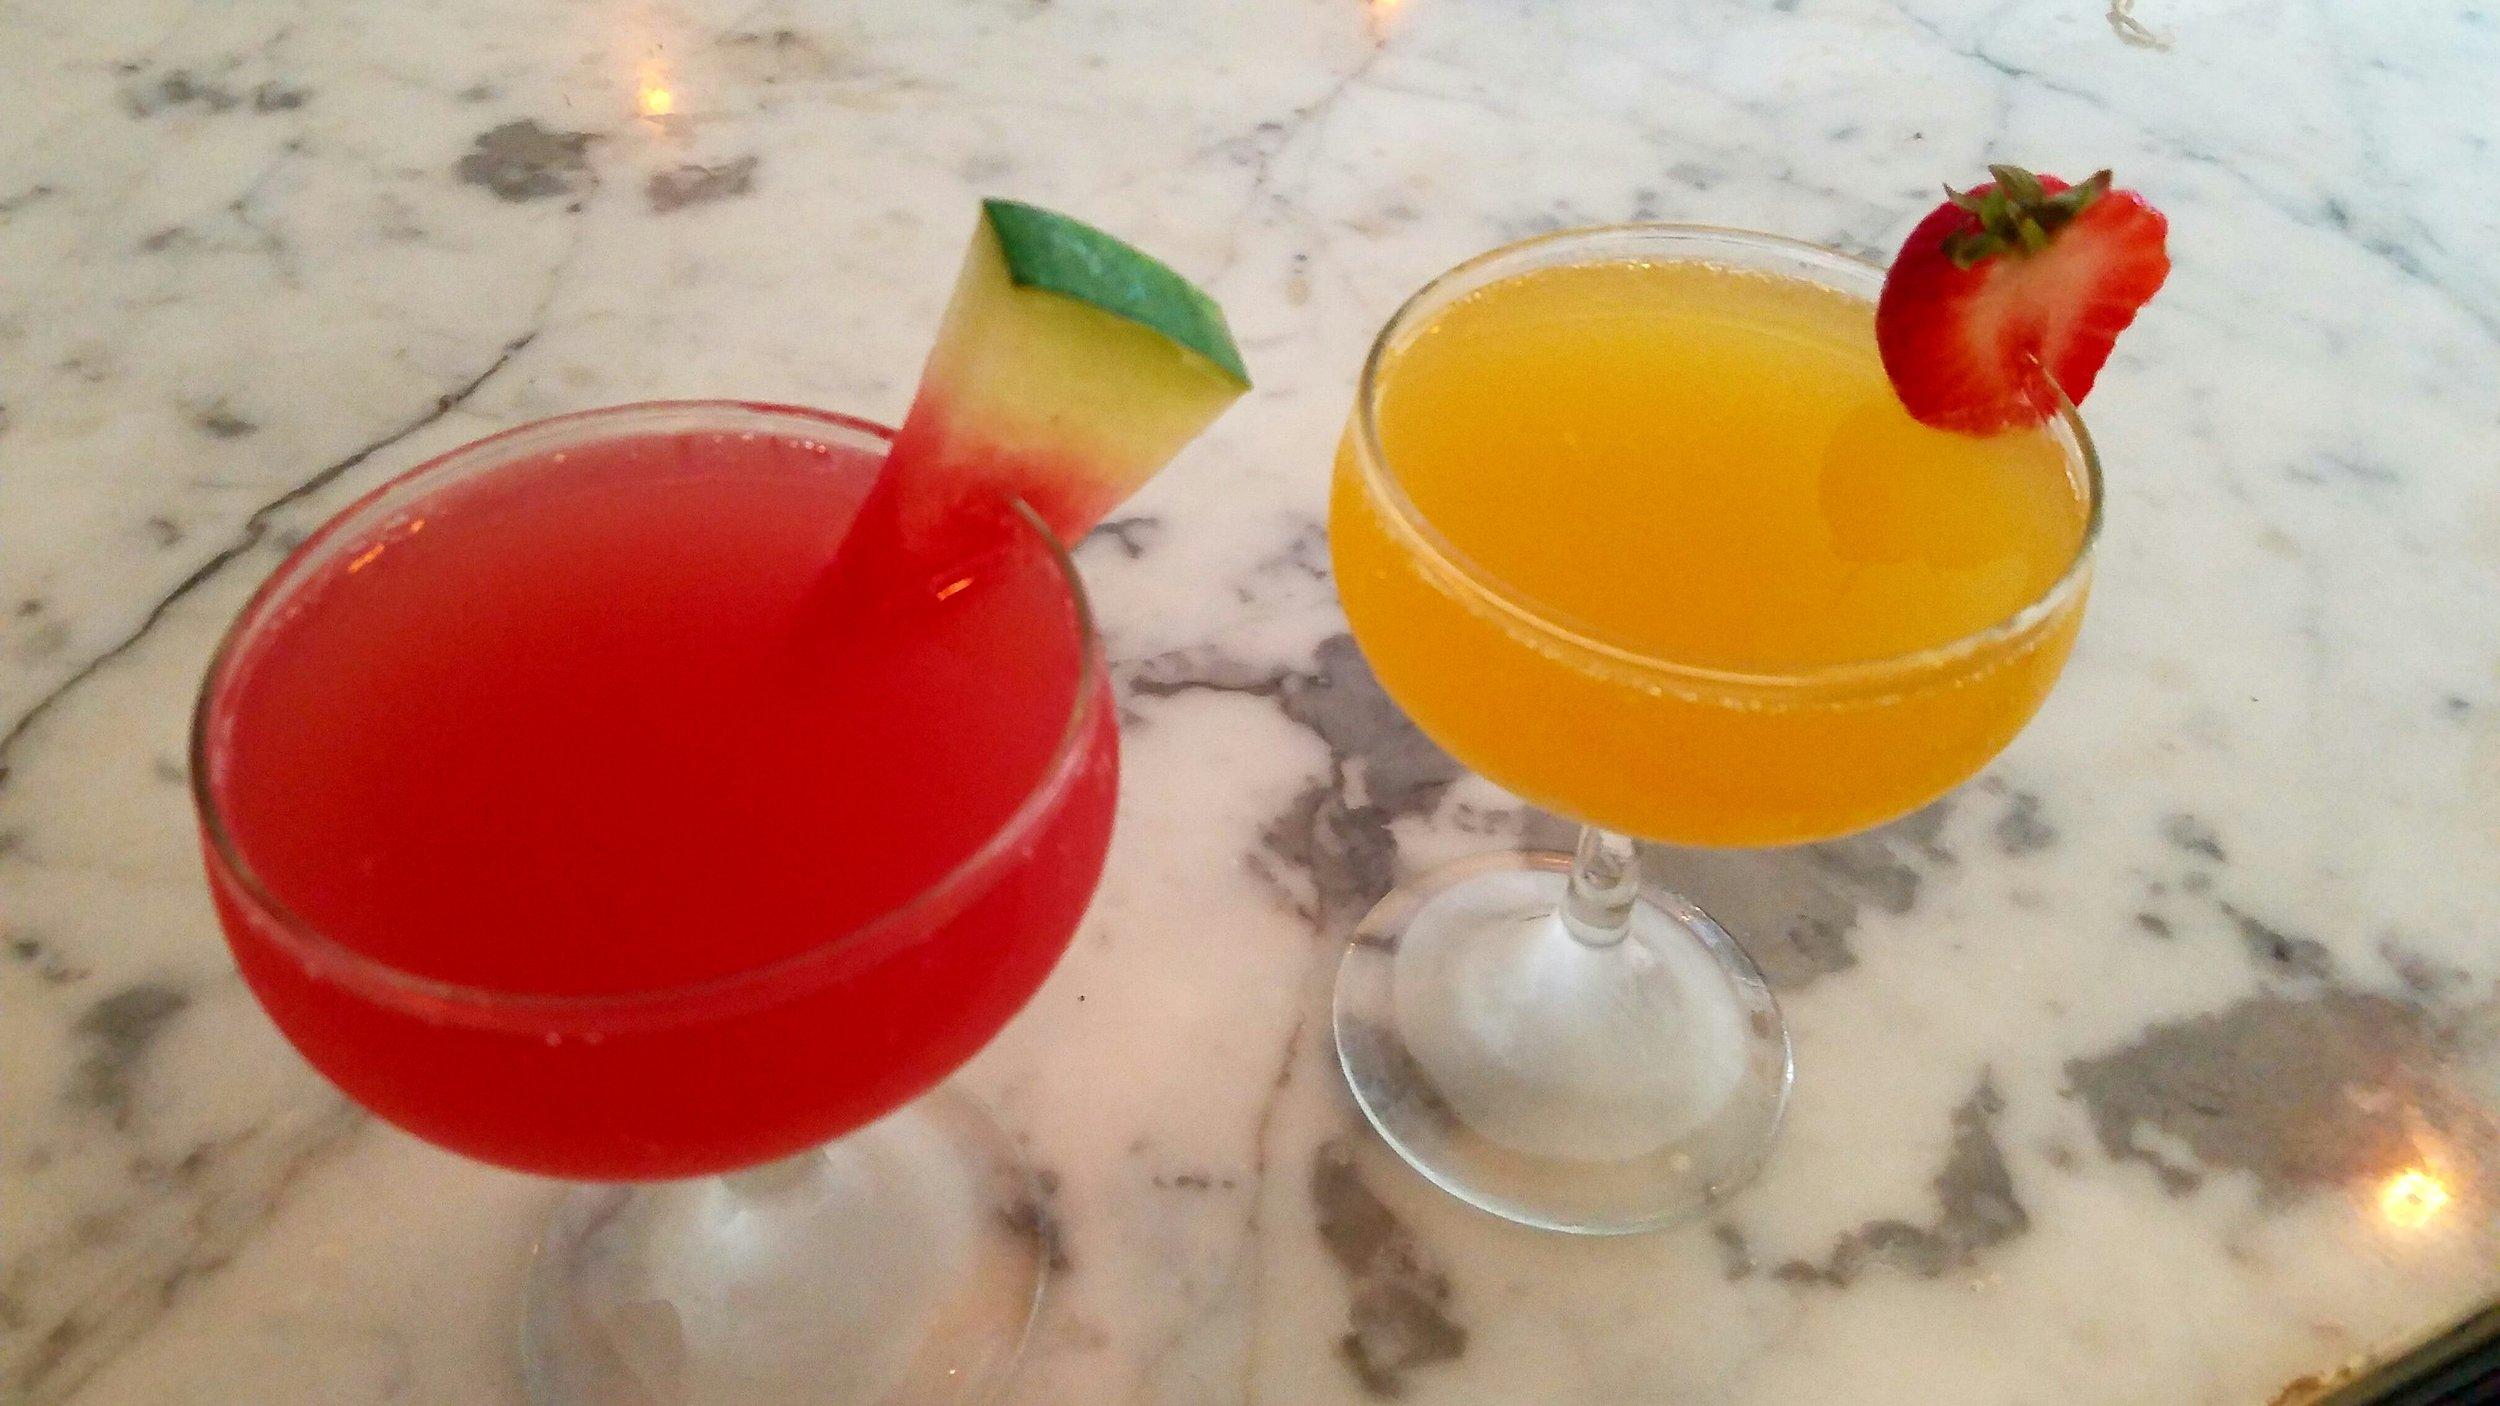 mimosas-brooklyn-newyork-williamsburg-brunch-restaurant-local-organic-lunch-dinner-happy-hour-clo-cafe-guatemalan-spanish.JPG